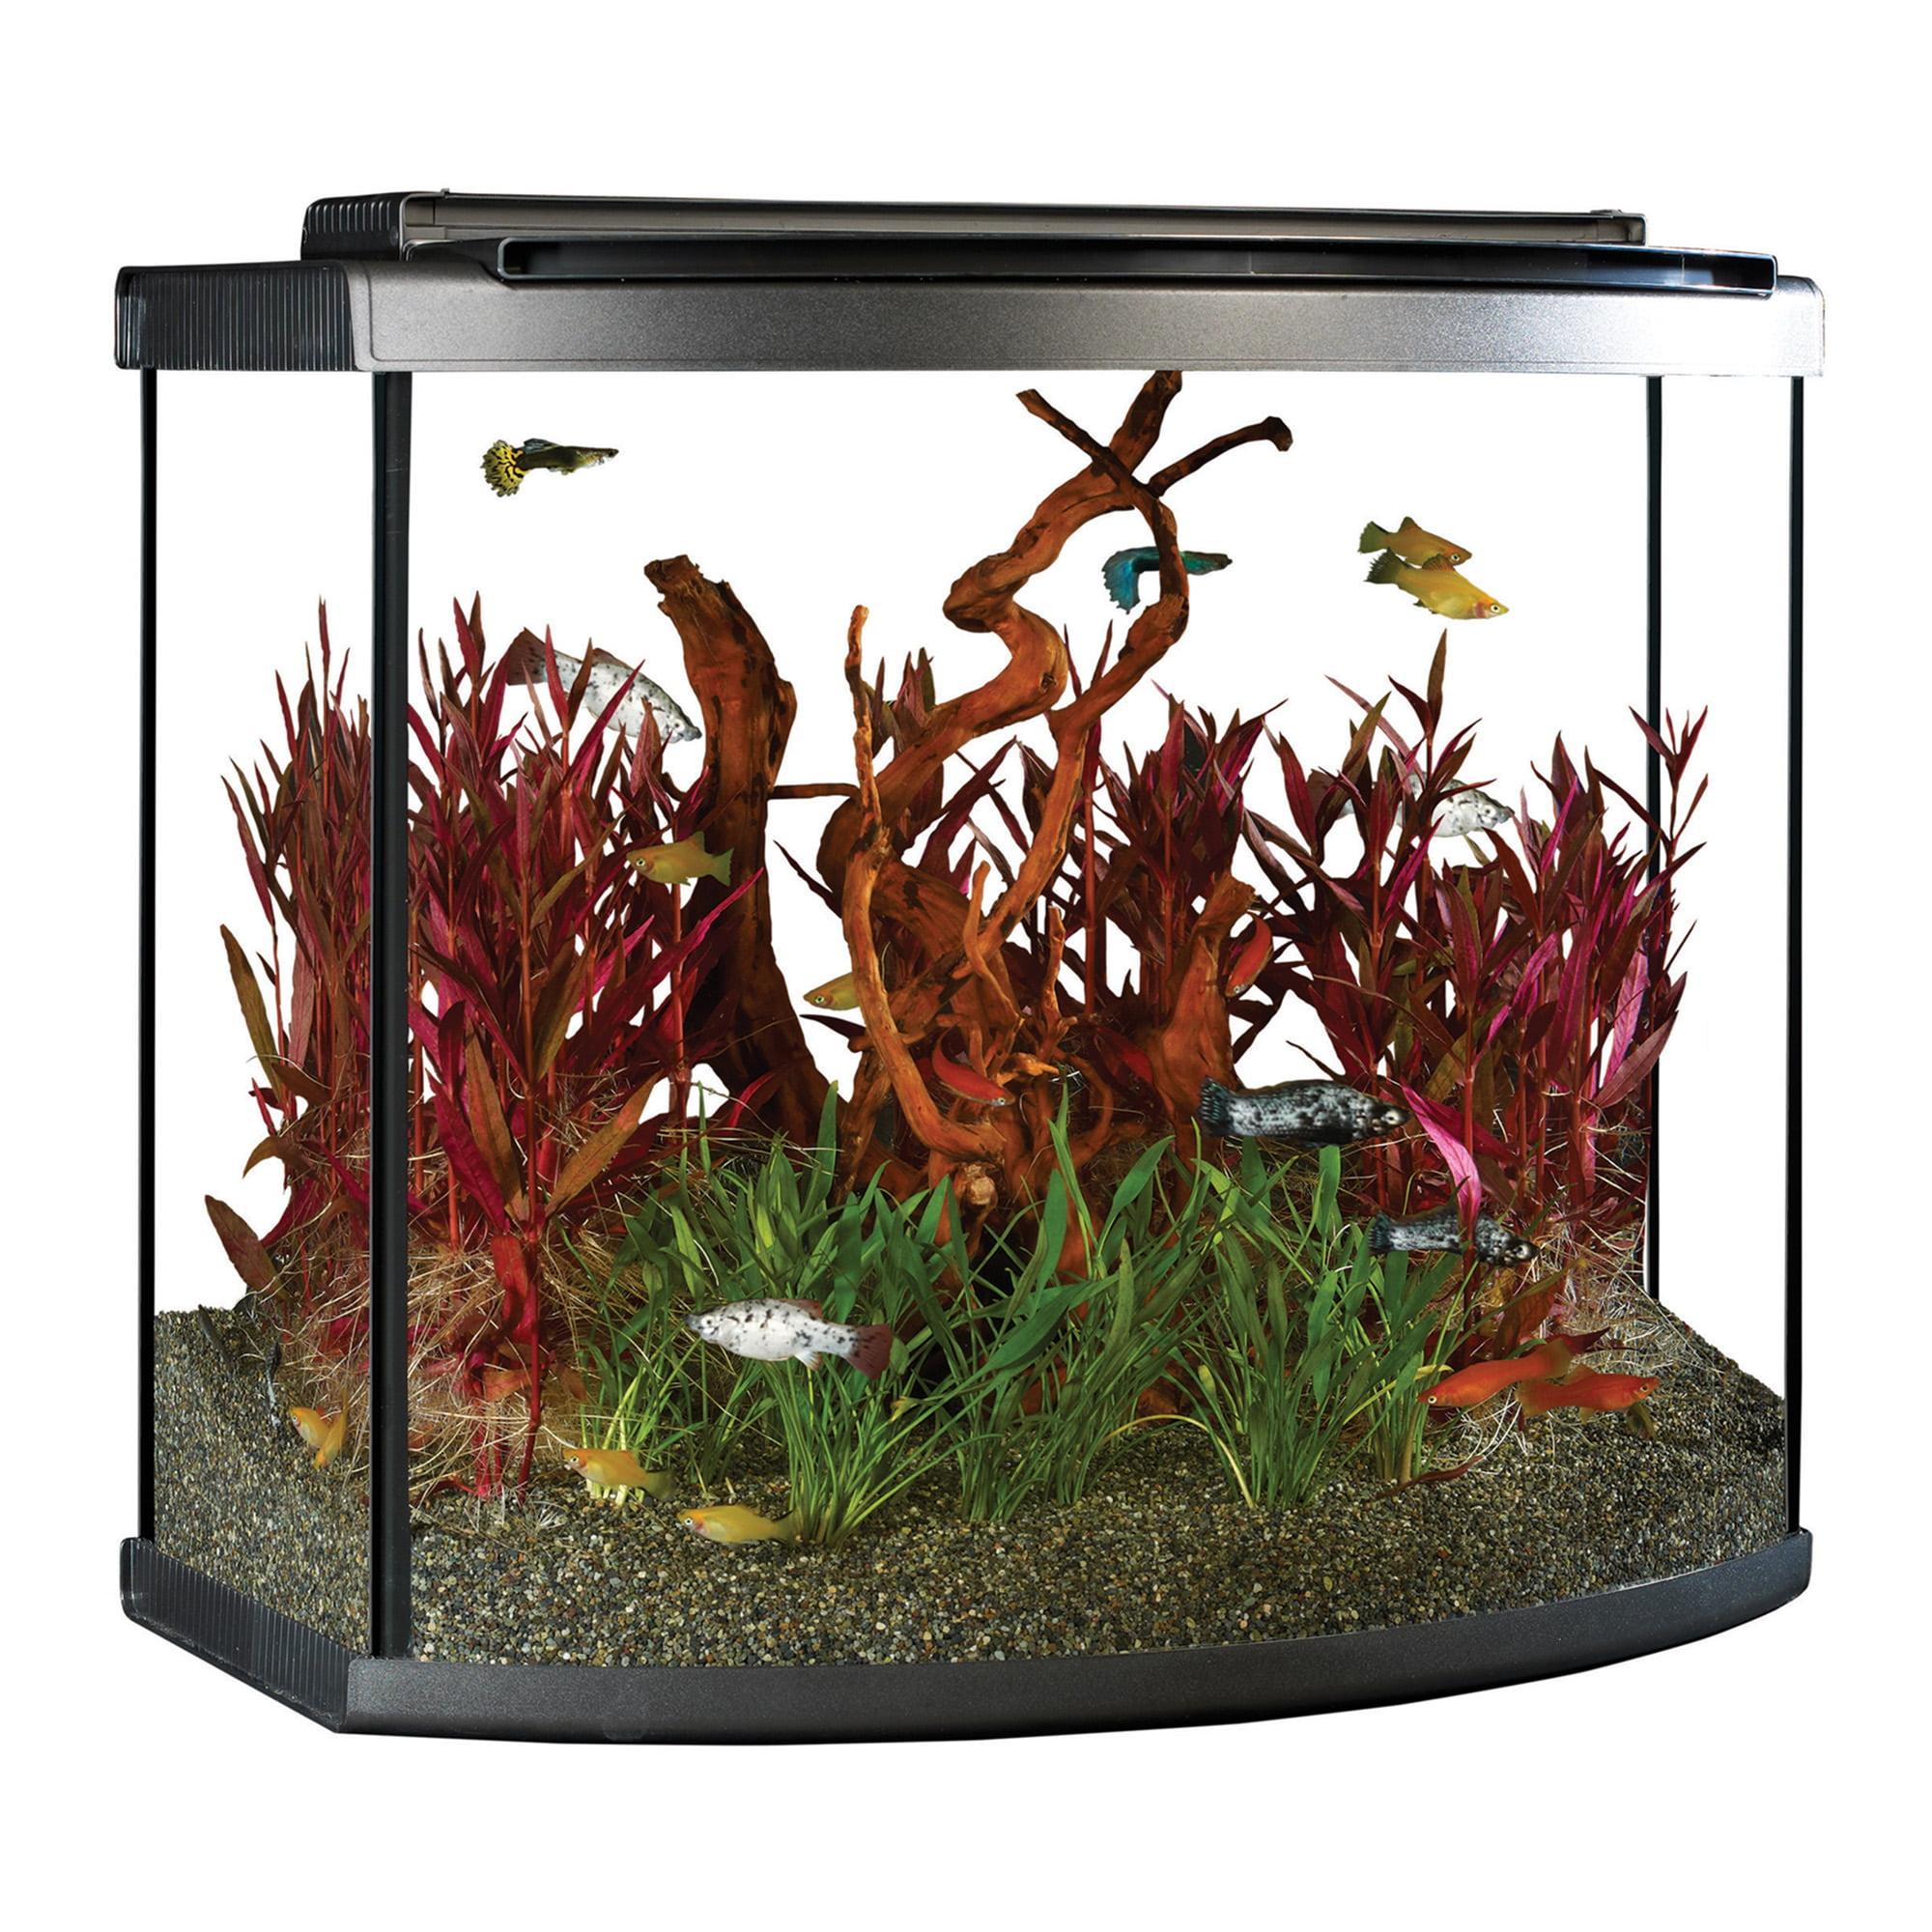 Fluval 26-Gallon Bow LED Aquarium Starter Kit by Hagen